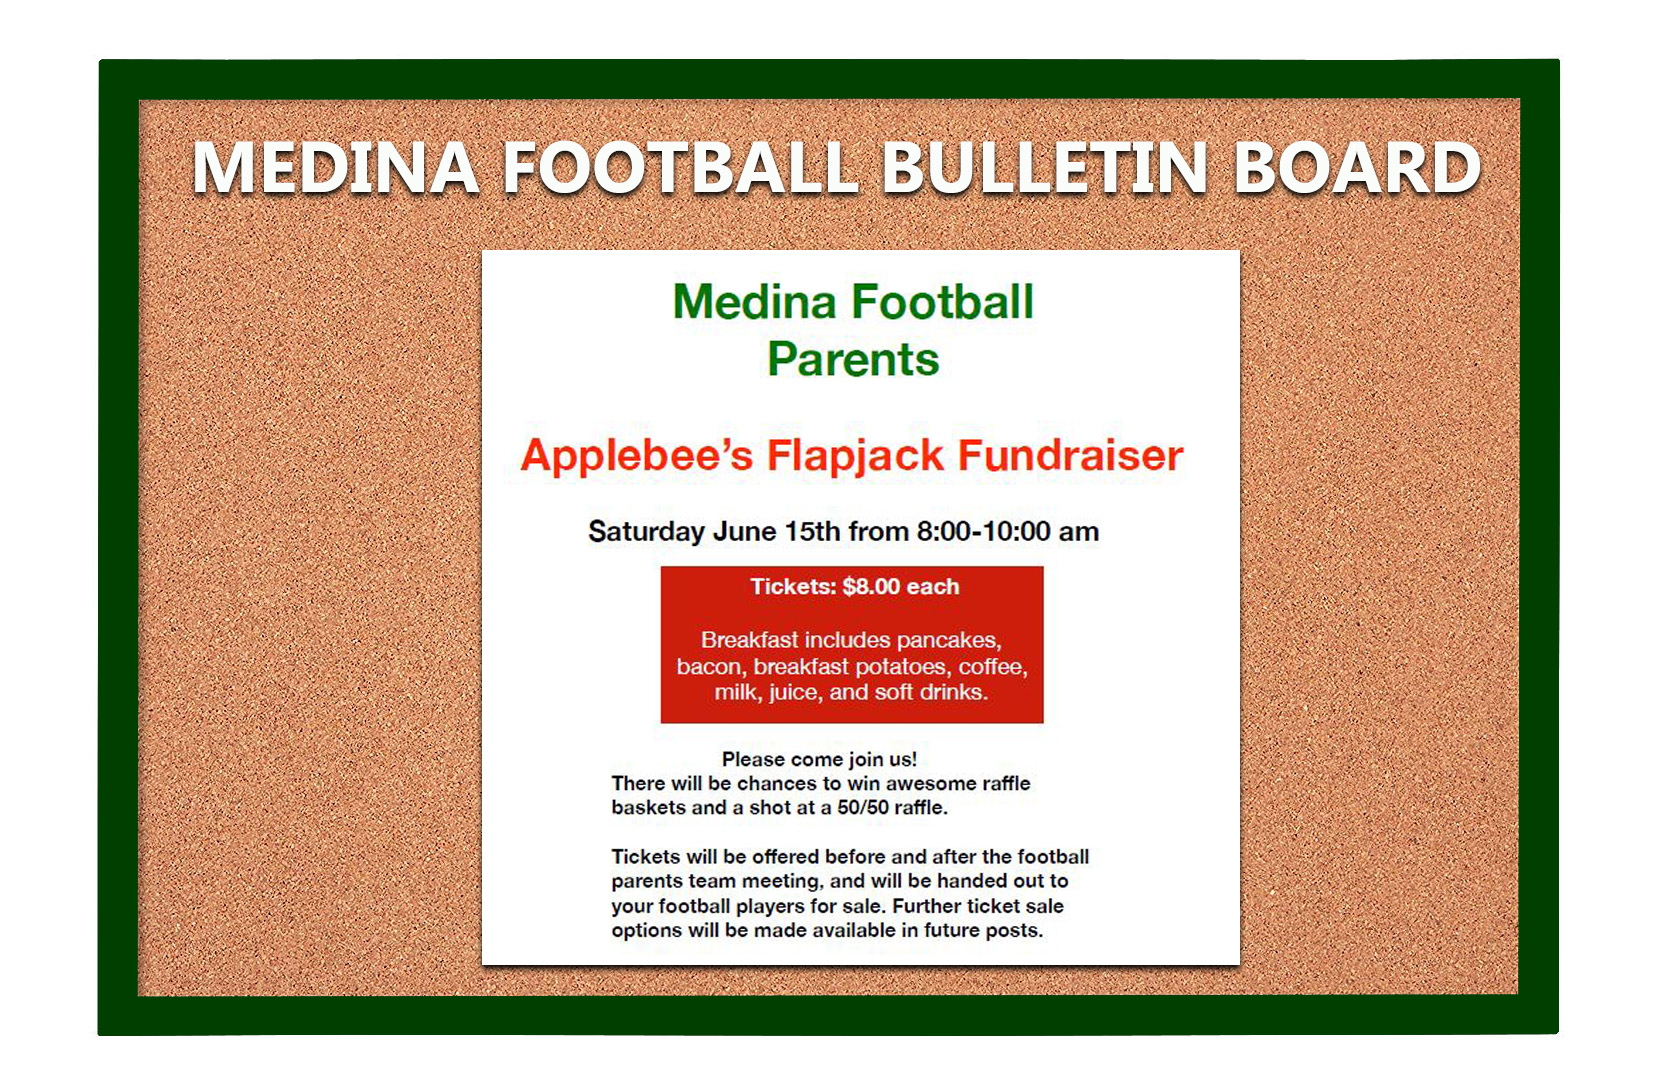 Football Bulletin Board.jpg